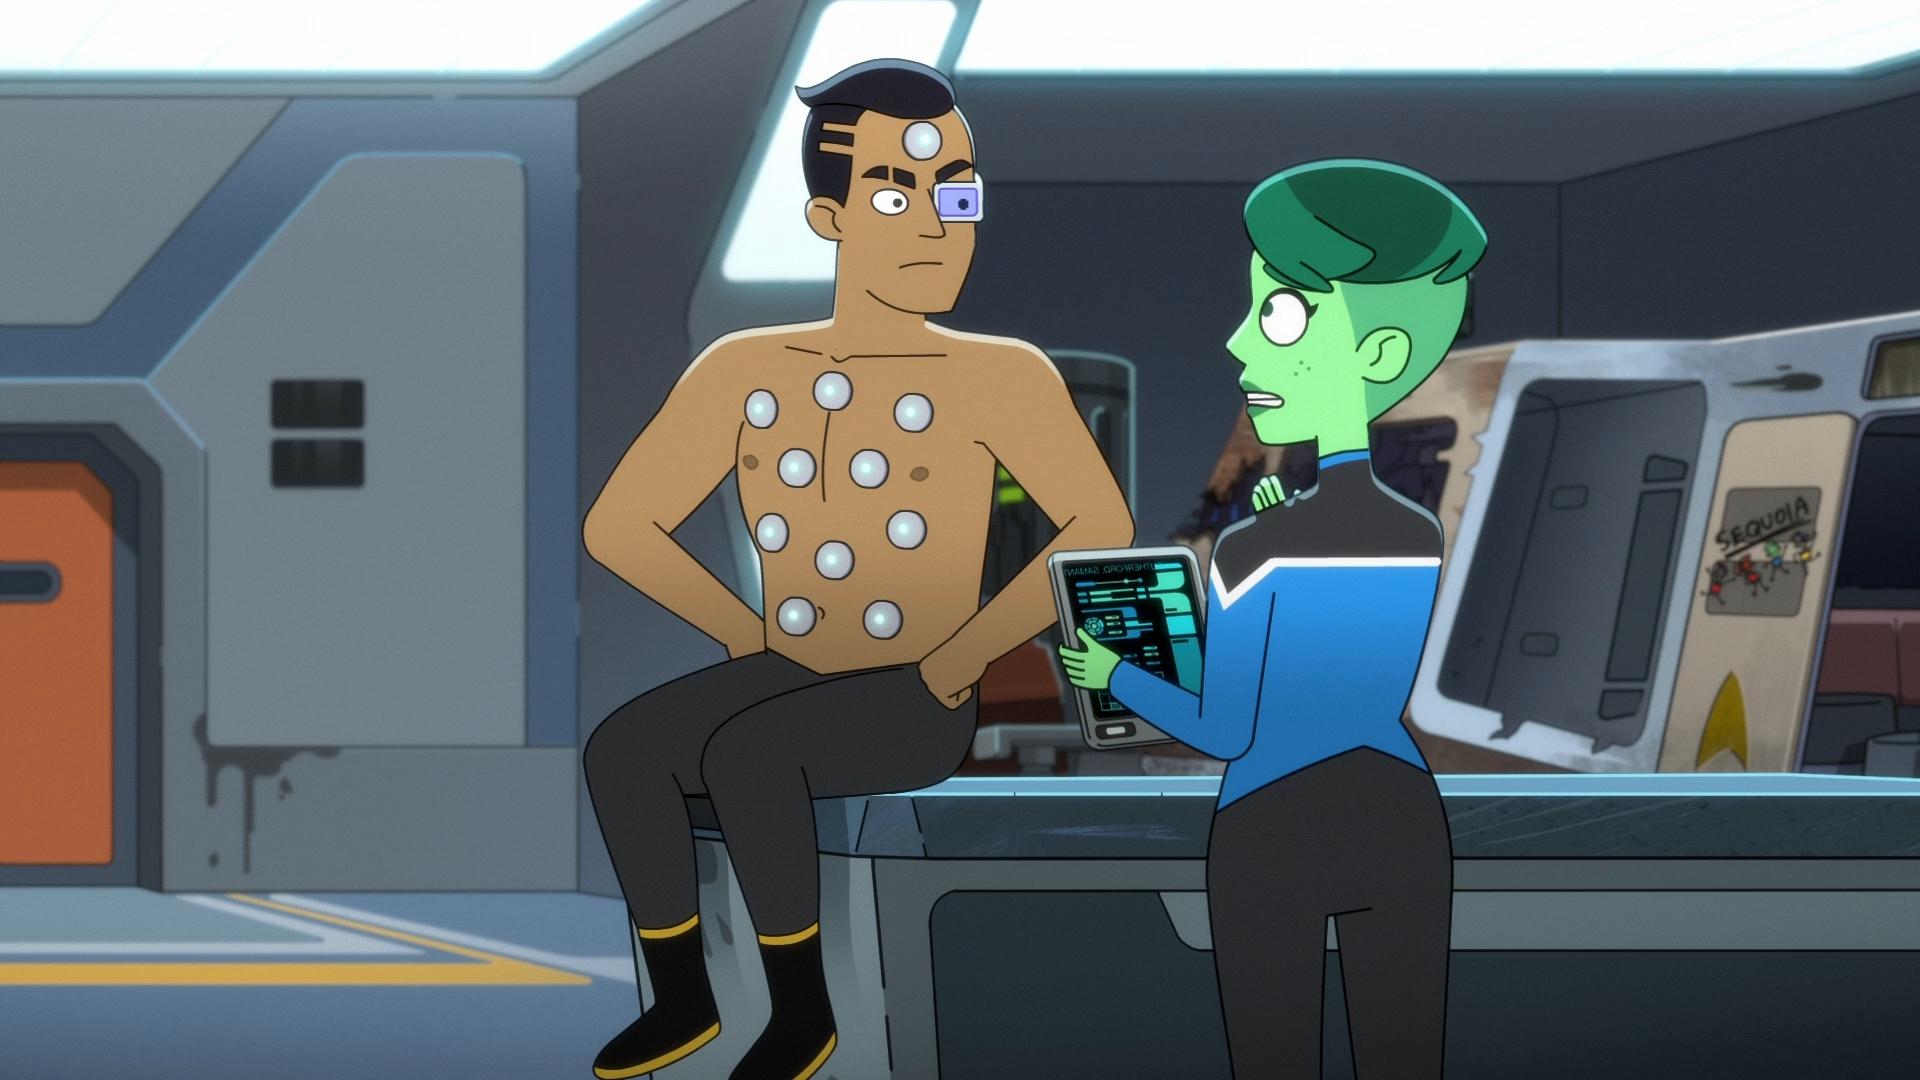 Star Trek: Cubiertas inferiores Temporada 2 (2021) 1080p WEB-DL